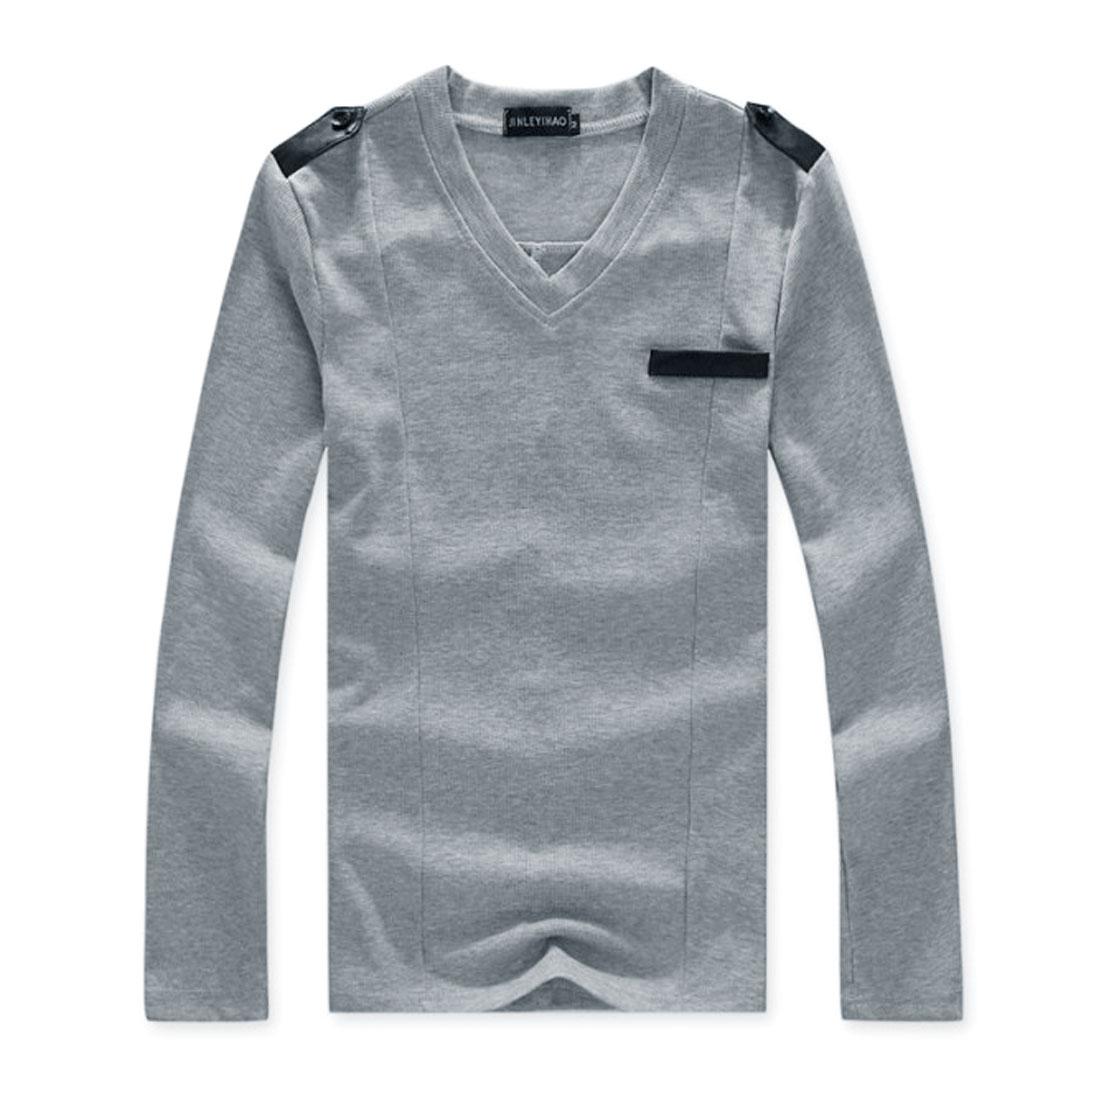 Men Fashion V Neck Ribbing Heather Gray Close-fitting Shirt S